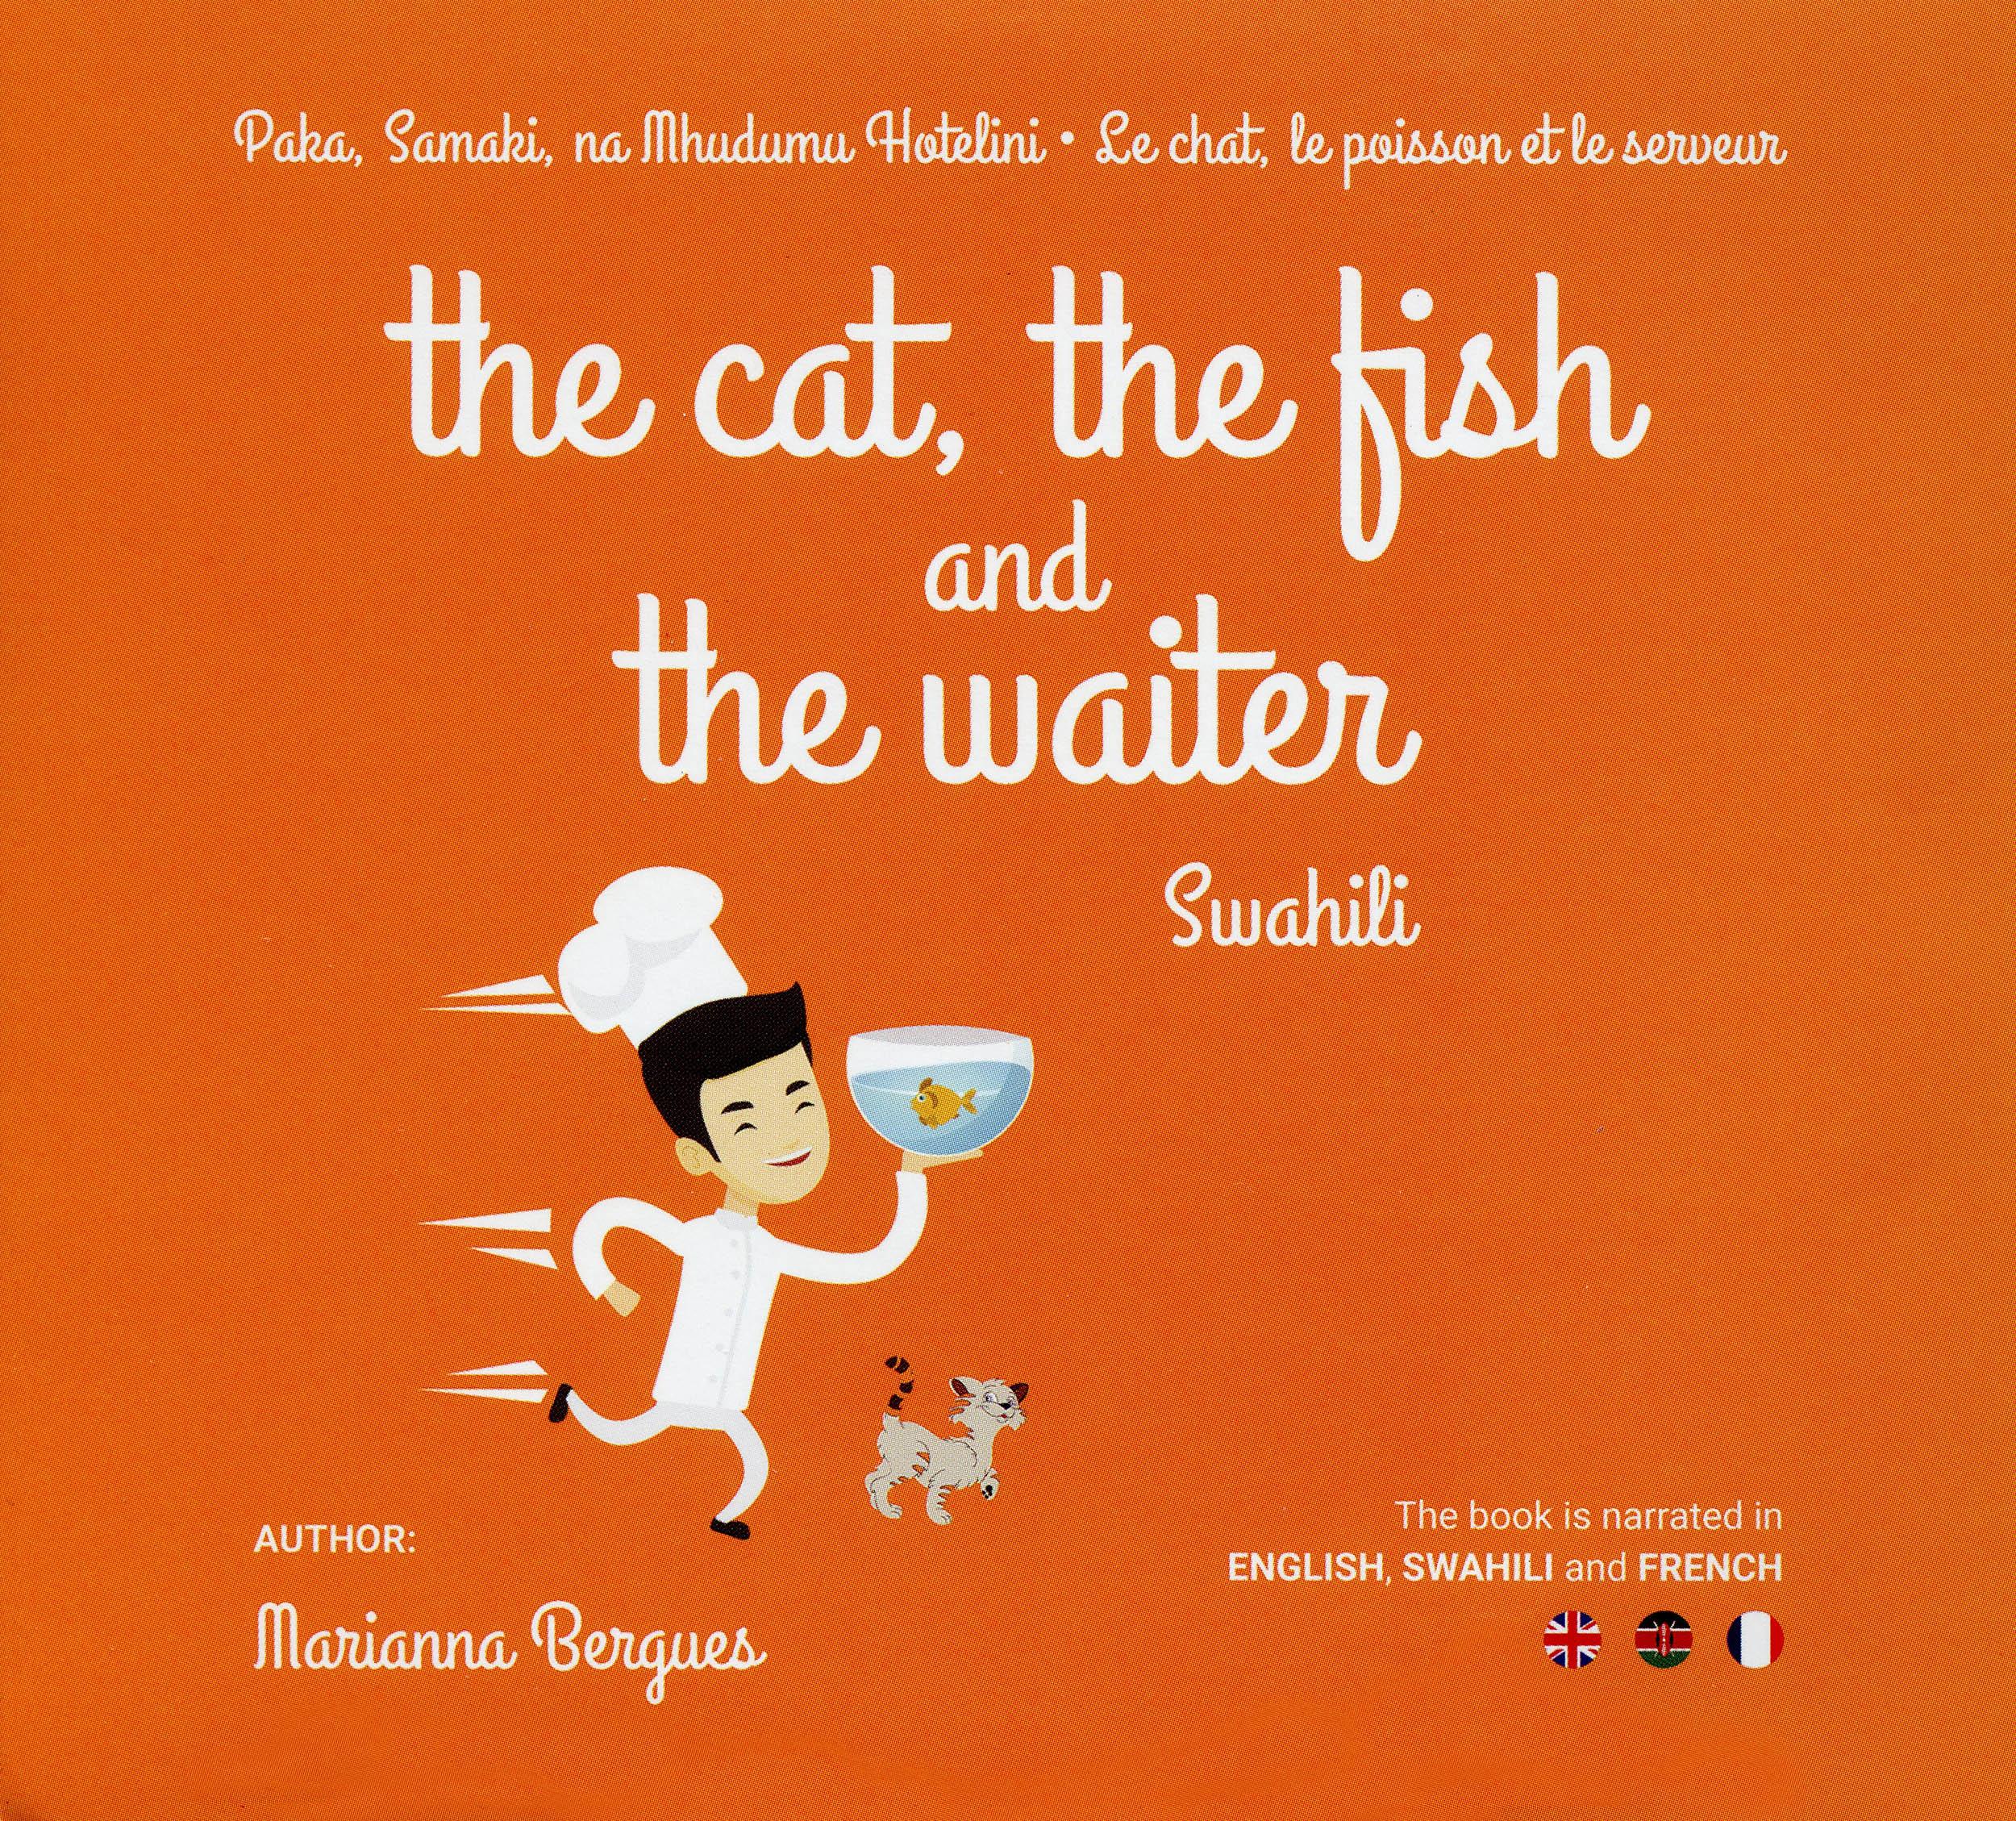 swahili cd cover